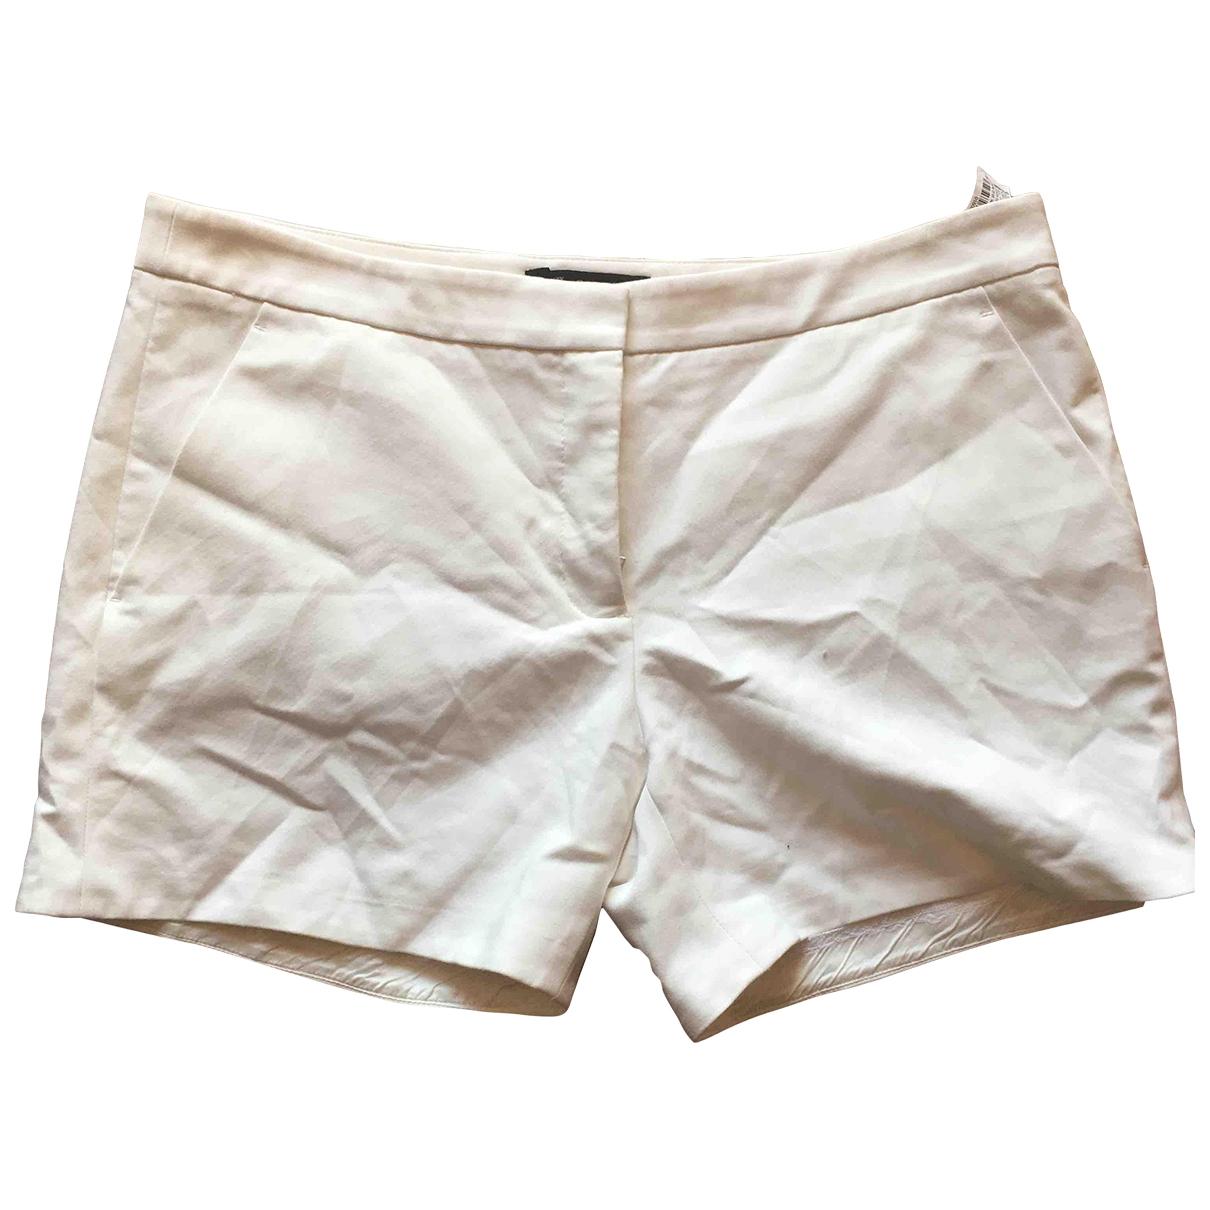 Zara \N Shorts in  Weiss Baumwolle - Elasthan